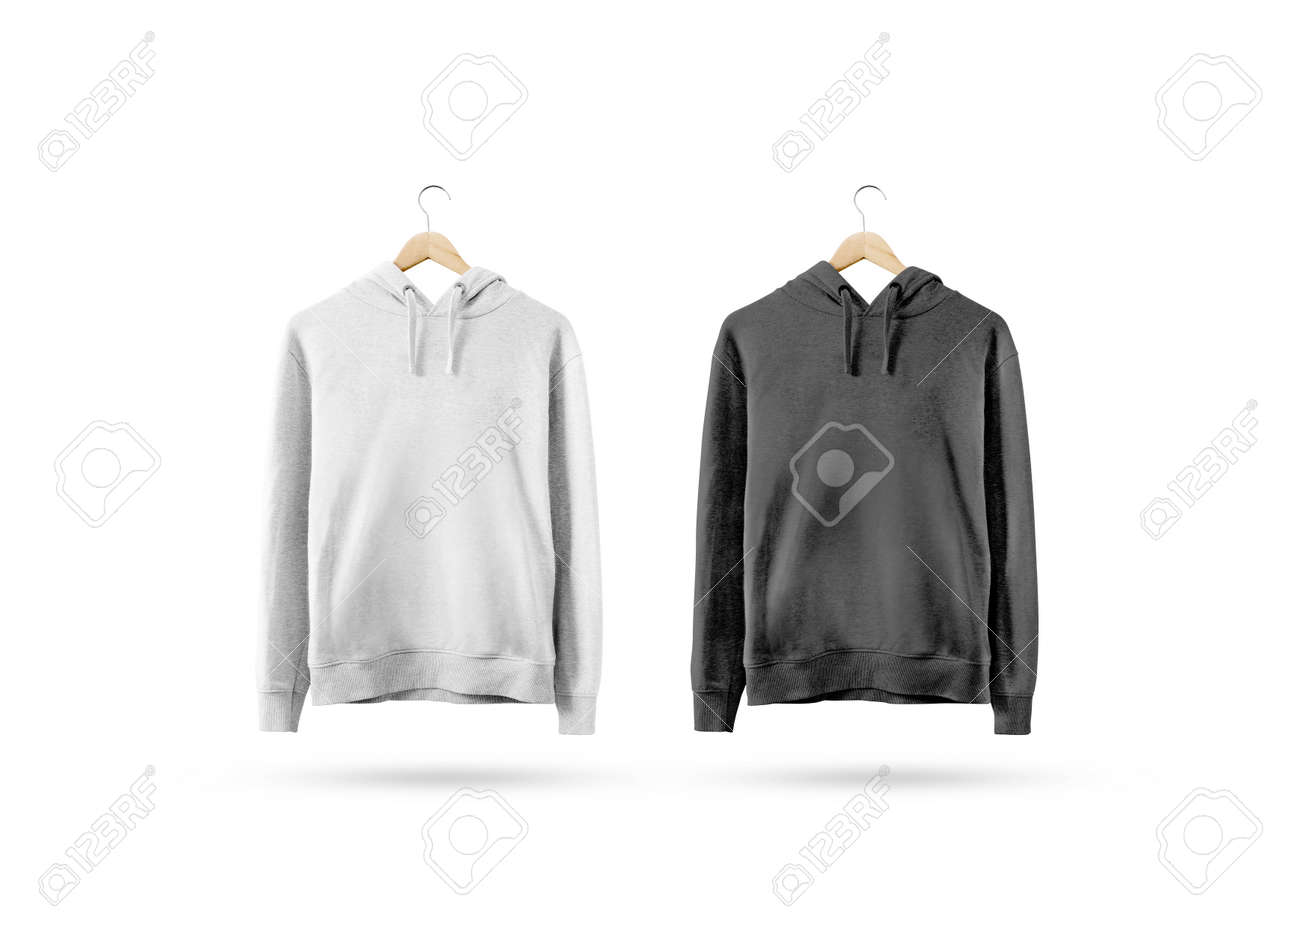 Blank Black And White Sweatshirt Mockup Hanging On Wooden Hanger ...